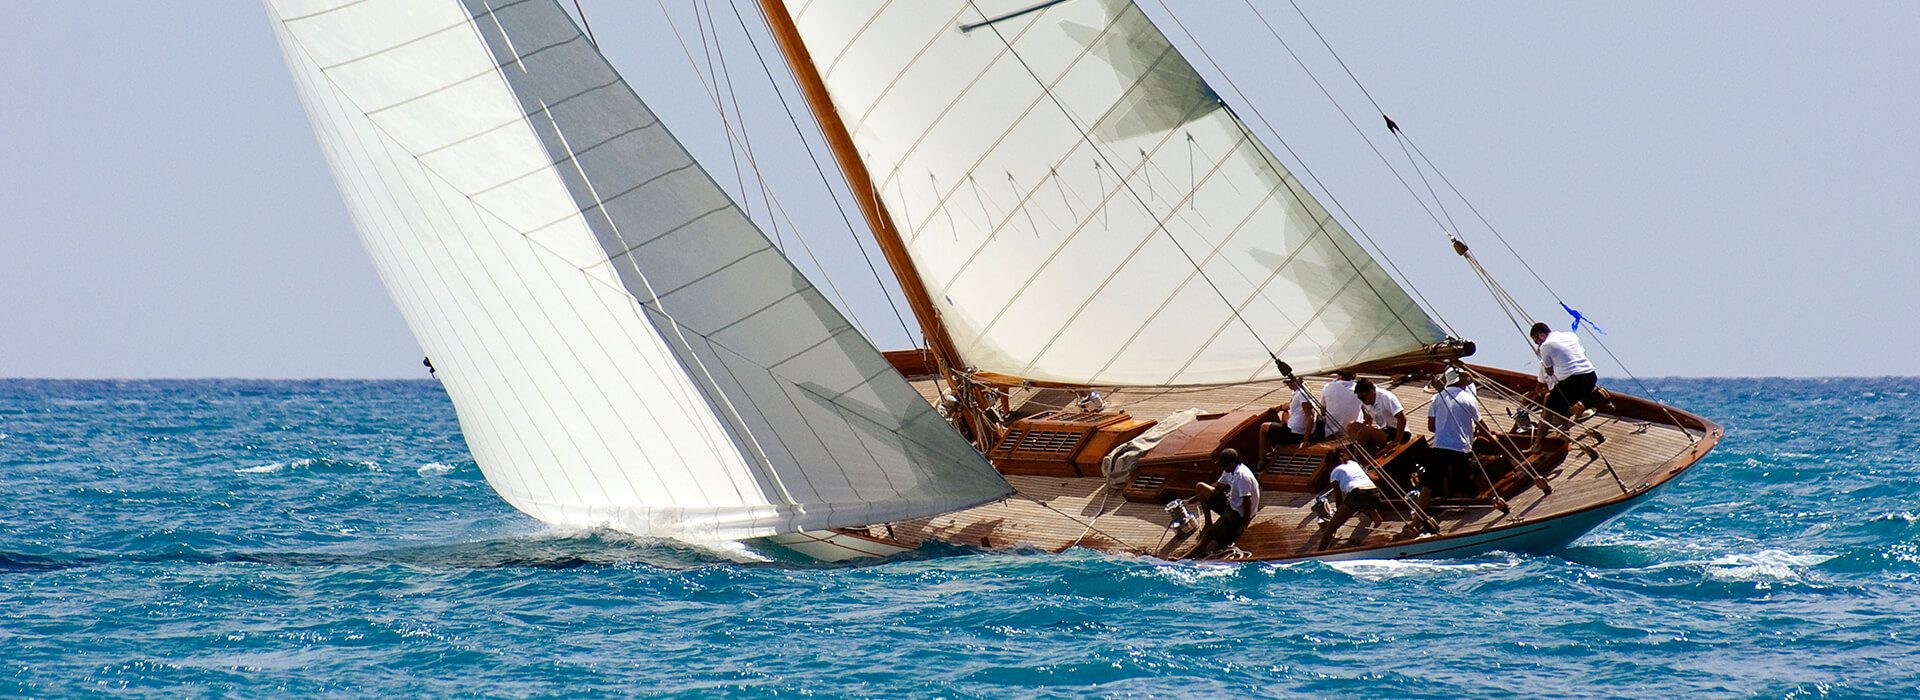 Brass Seacock Valves for Boats & Marine